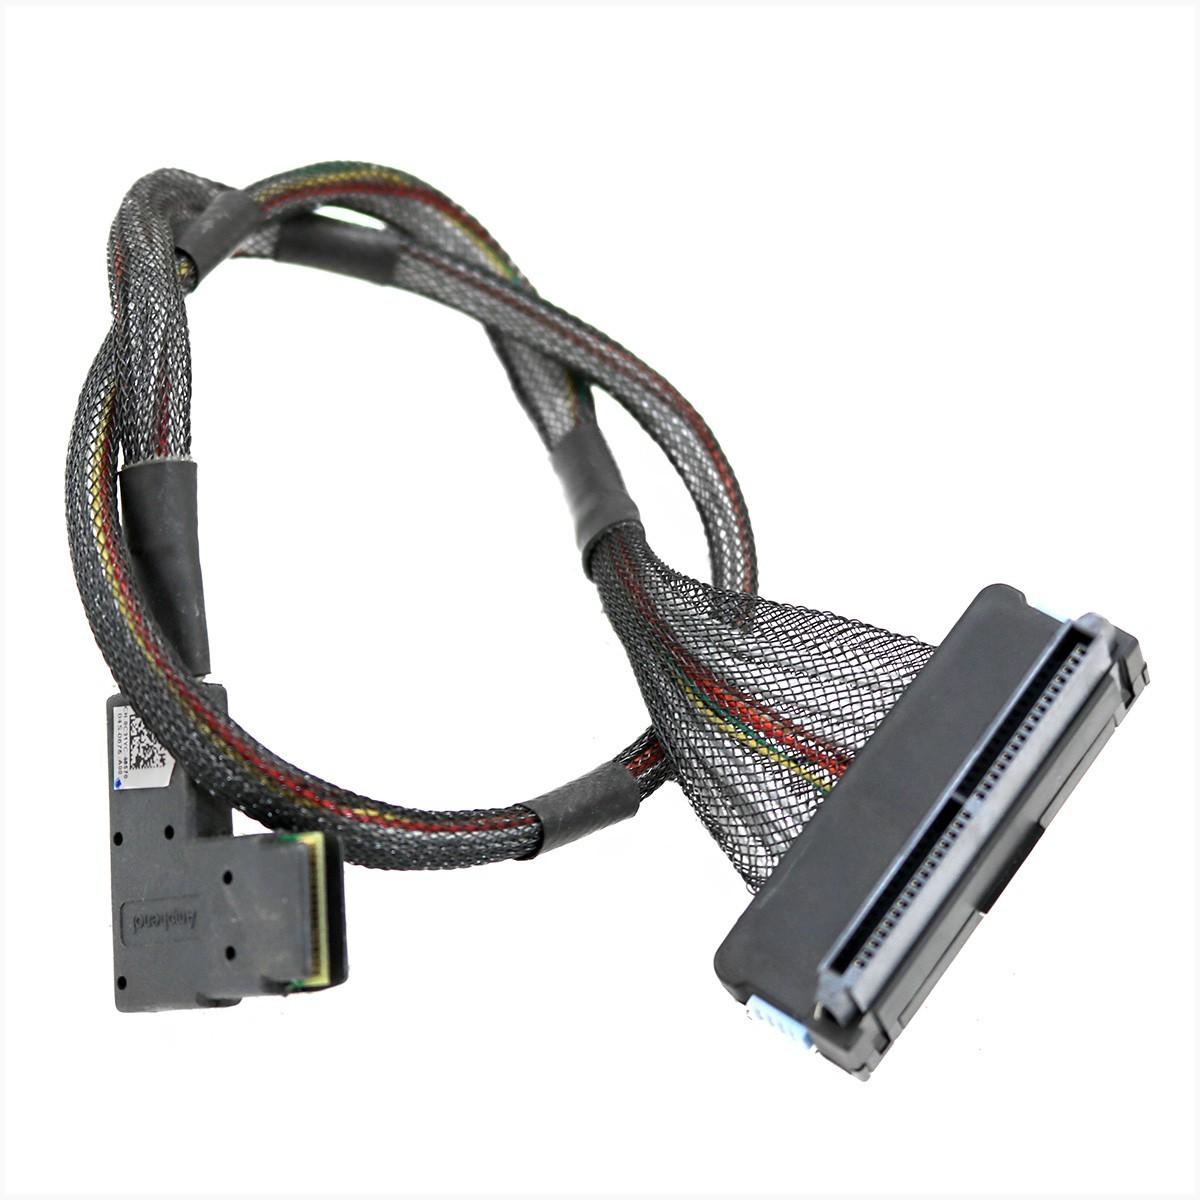 Cabo minisas para servidores dell r610 r710 0c31yc - usado